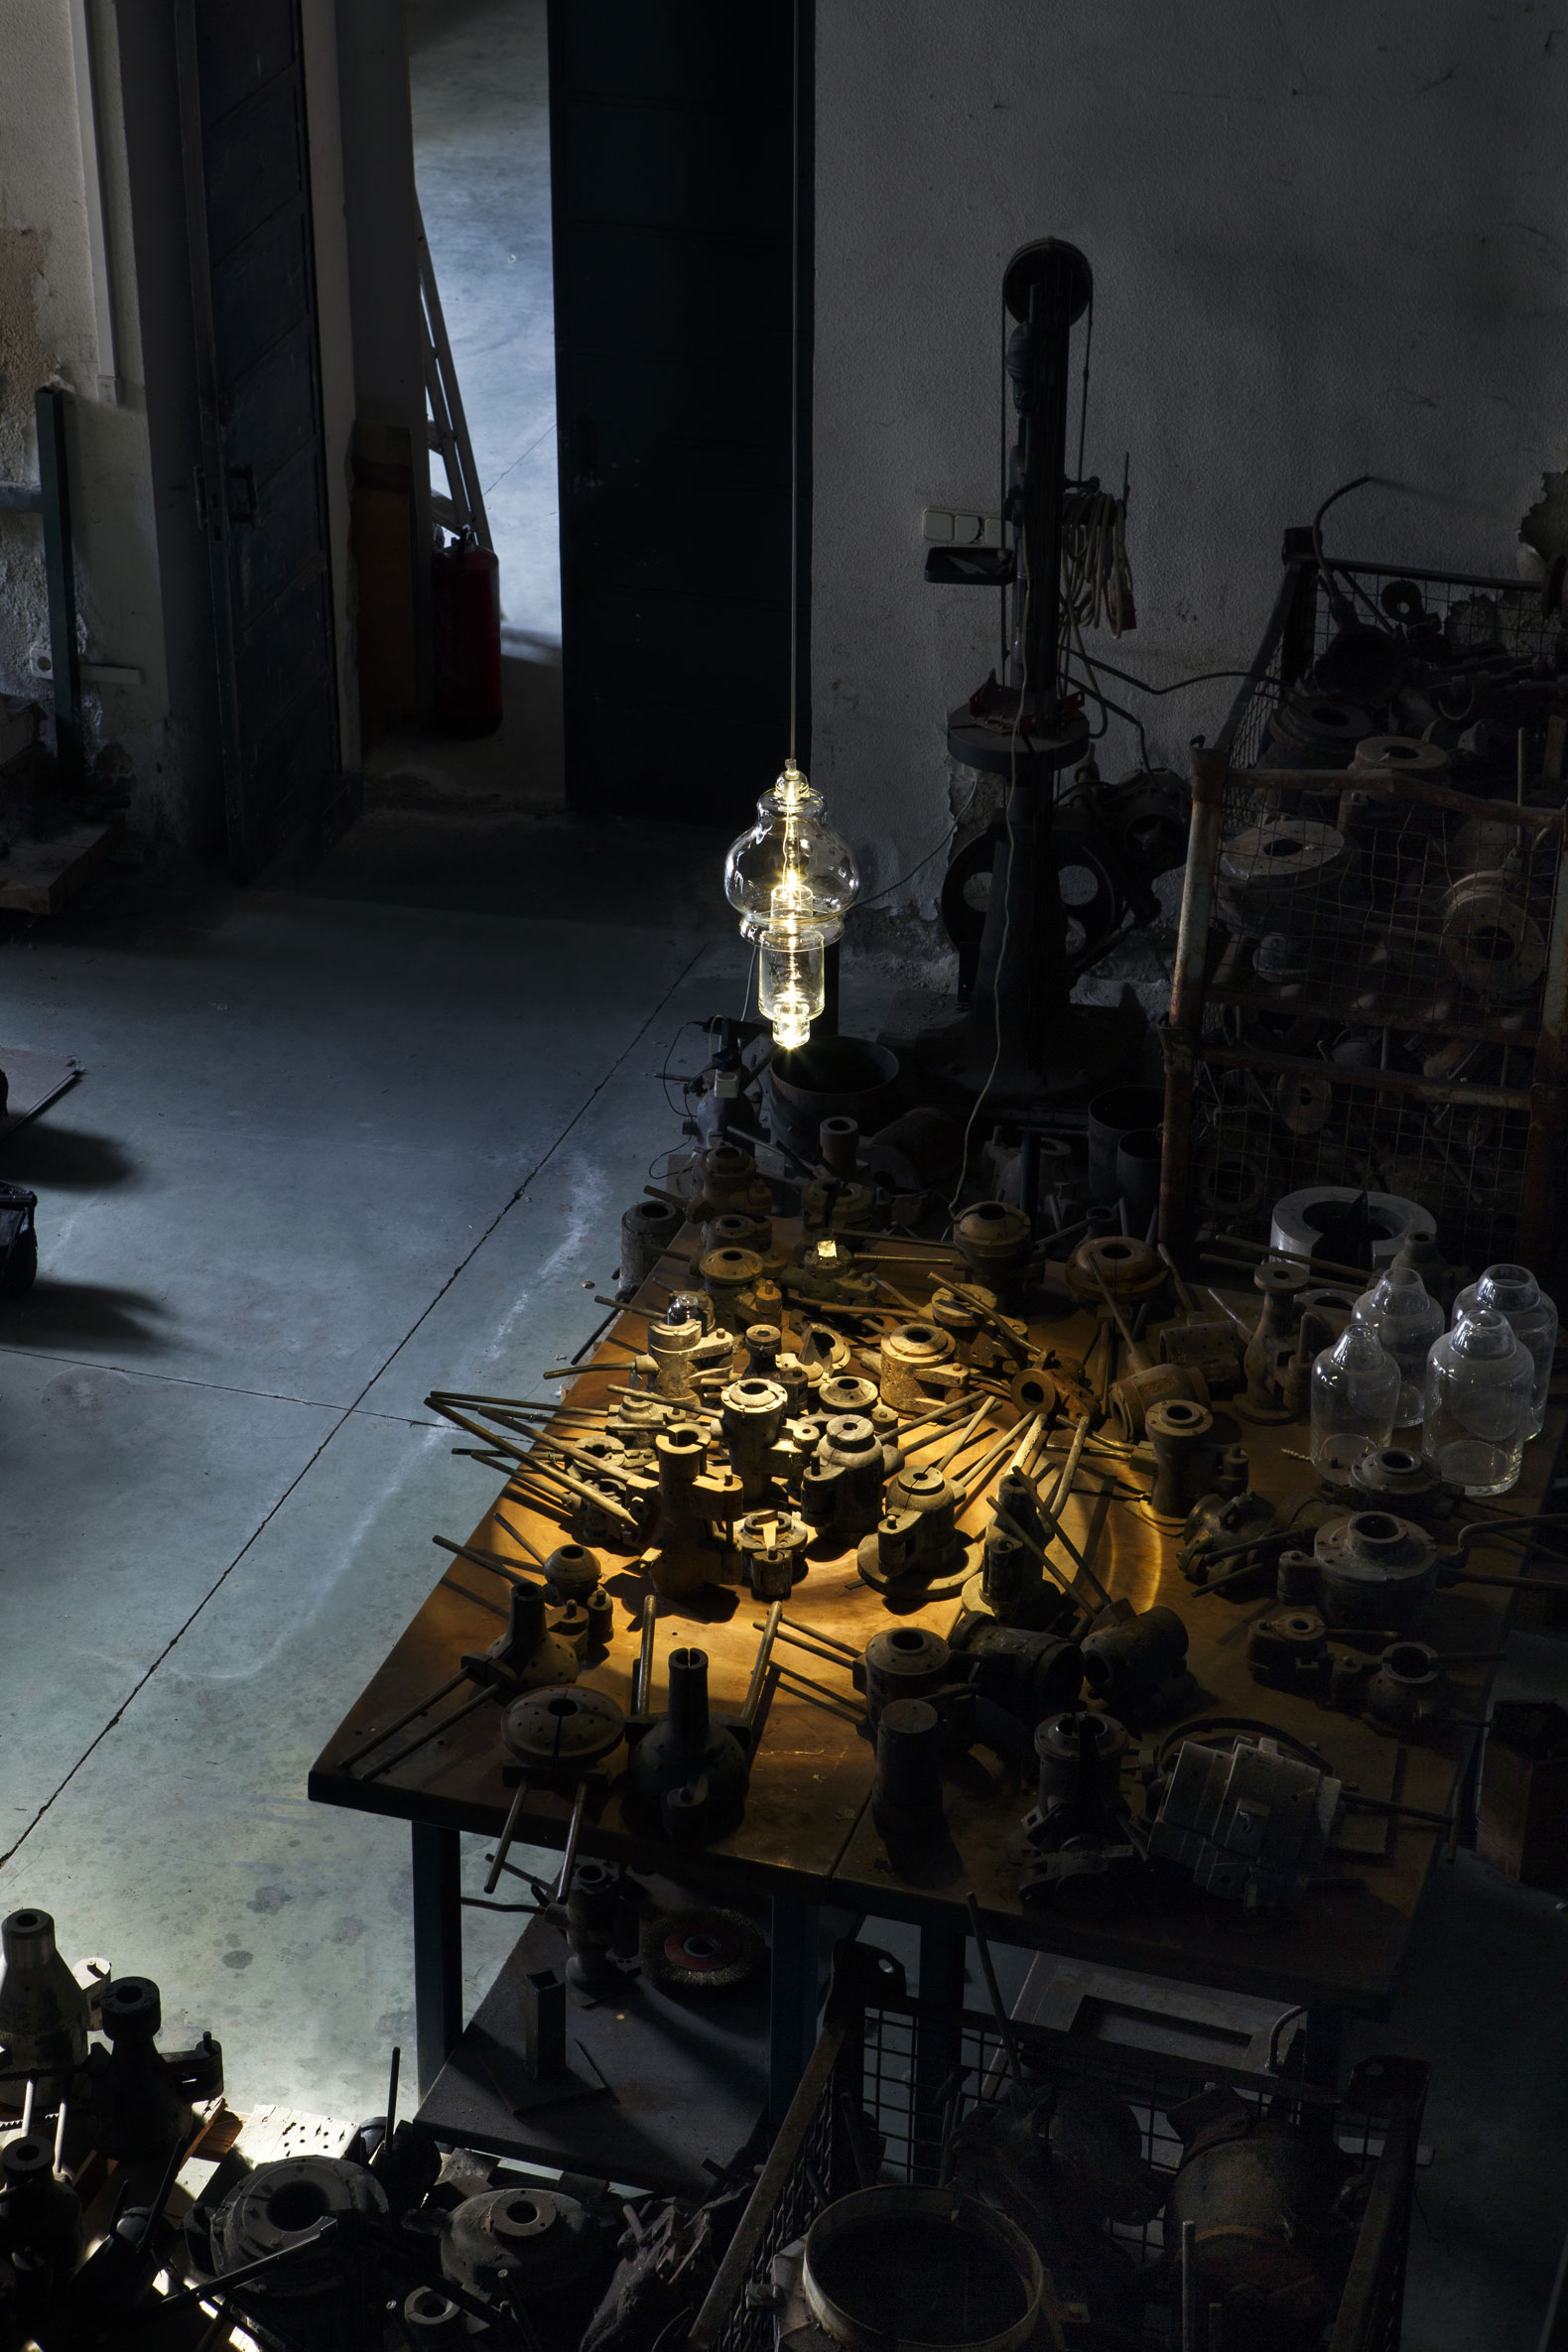 Rfc+ collection, 13 suspended blown glass lamps, by Mayice Estudio. Image courtesy de Mayice Estudio